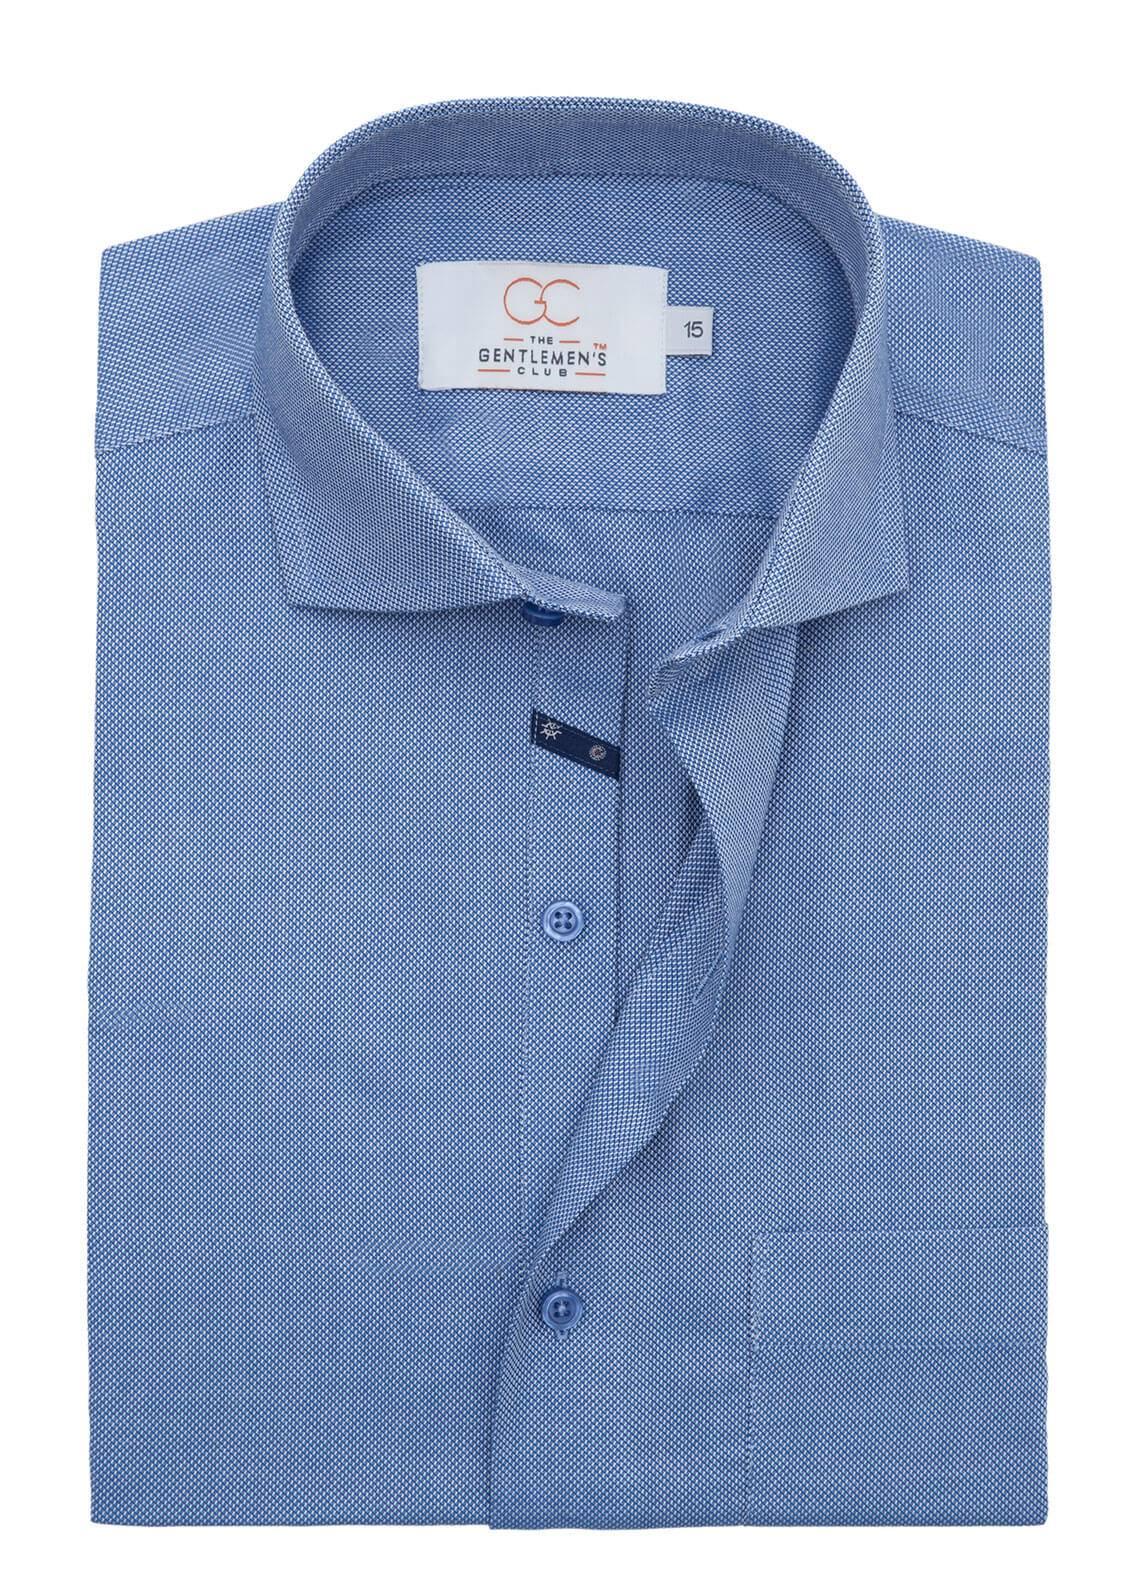 The Gentlemen's Club Cotton Formal Men Shirts - Blue White Label 4073 - 17.5